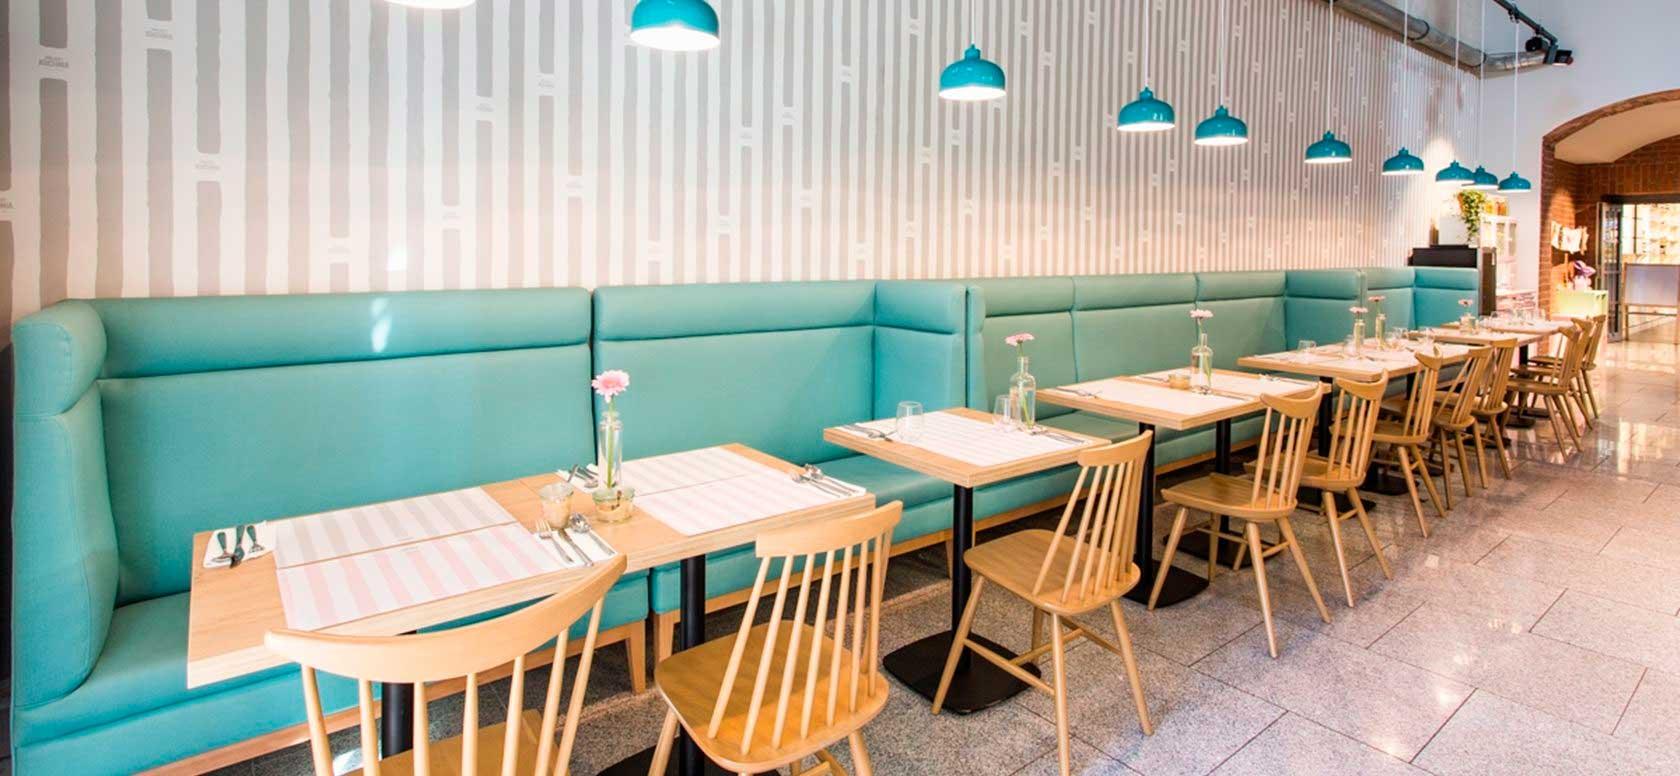 Mobiliario hostelería Tarragona. Mesas para Cafetería